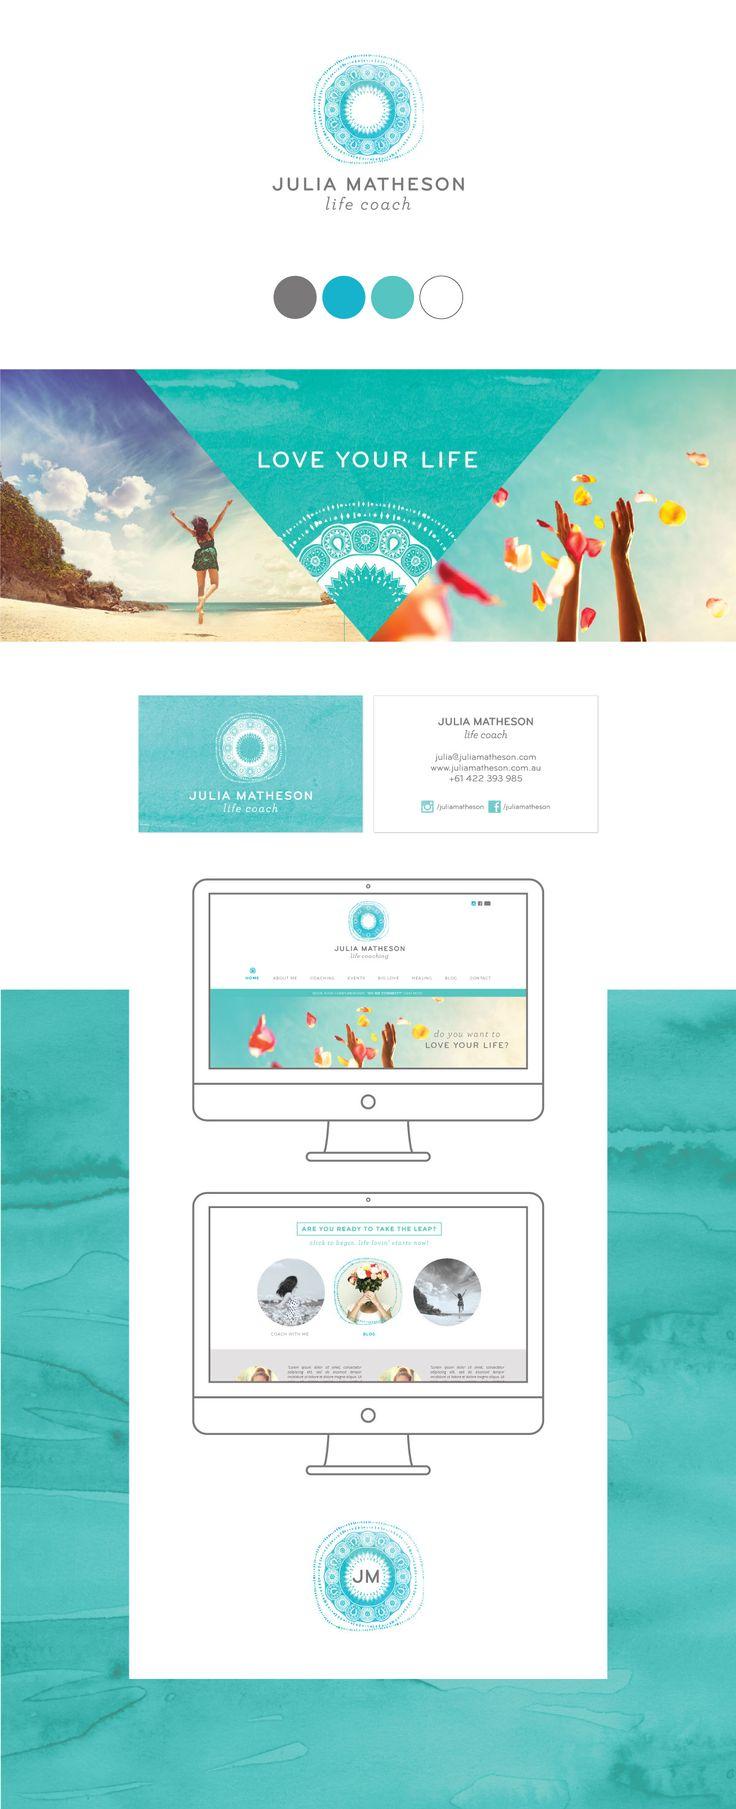 Julia Matheson | DWS branding & design. A fresh inspiring logo. Life coach logo. Turquoise and teal.